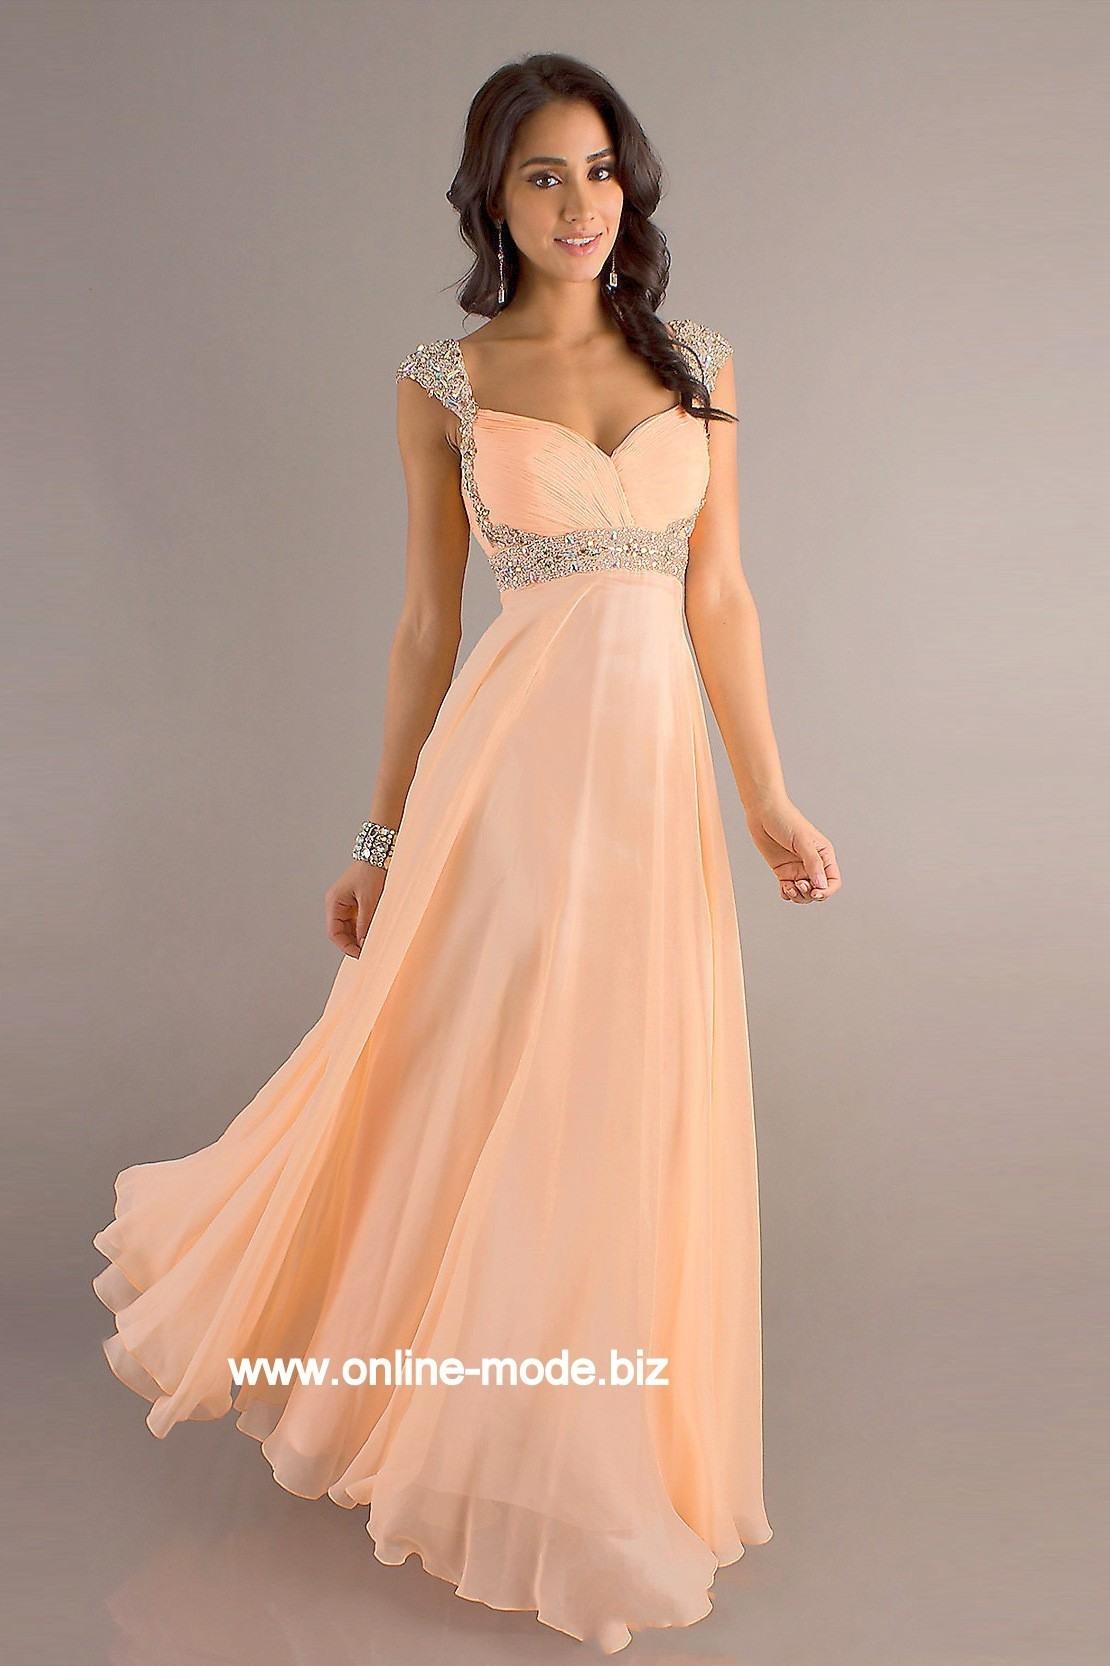 Designer Perfekt Abendkleid Cunda StylishDesigner Elegant Abendkleid Cunda Galerie